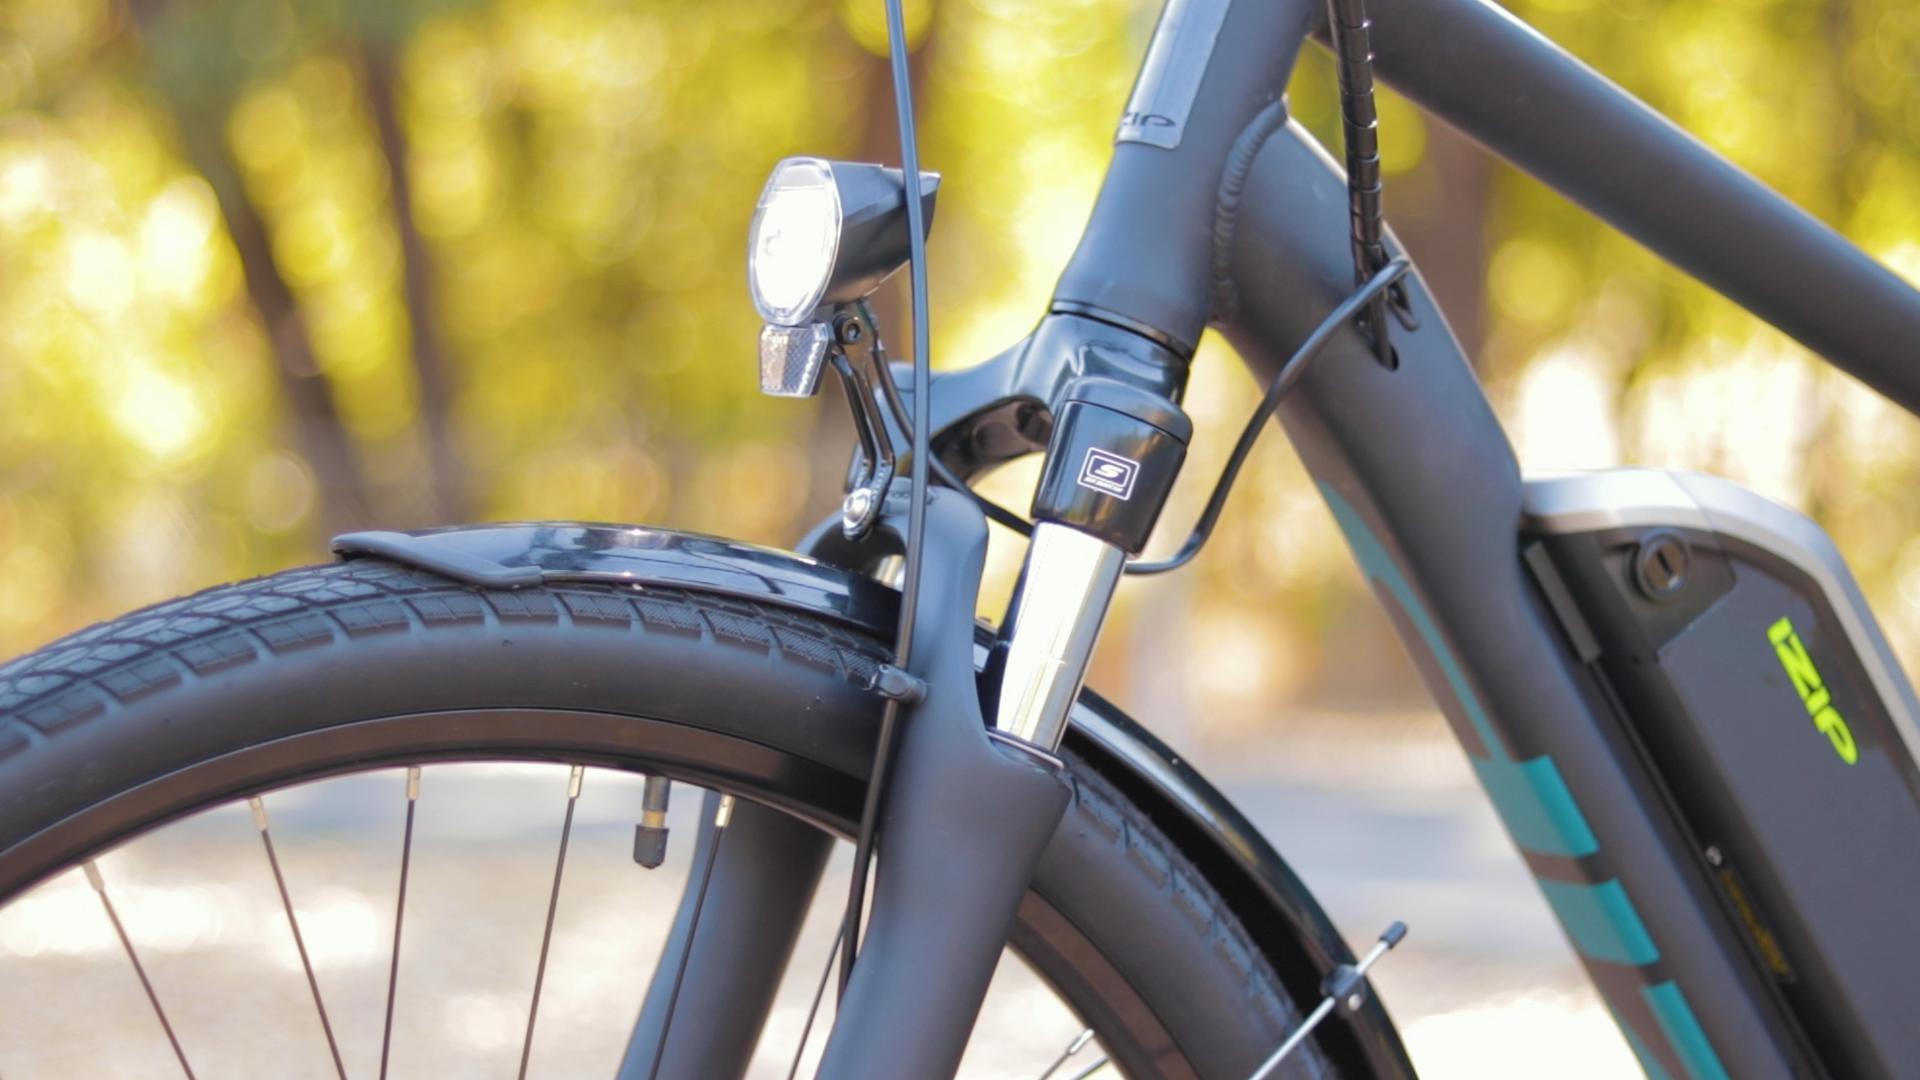 electrified-reviews-izip-e3-brio-electric-bike-review-headlight-profile.jpg